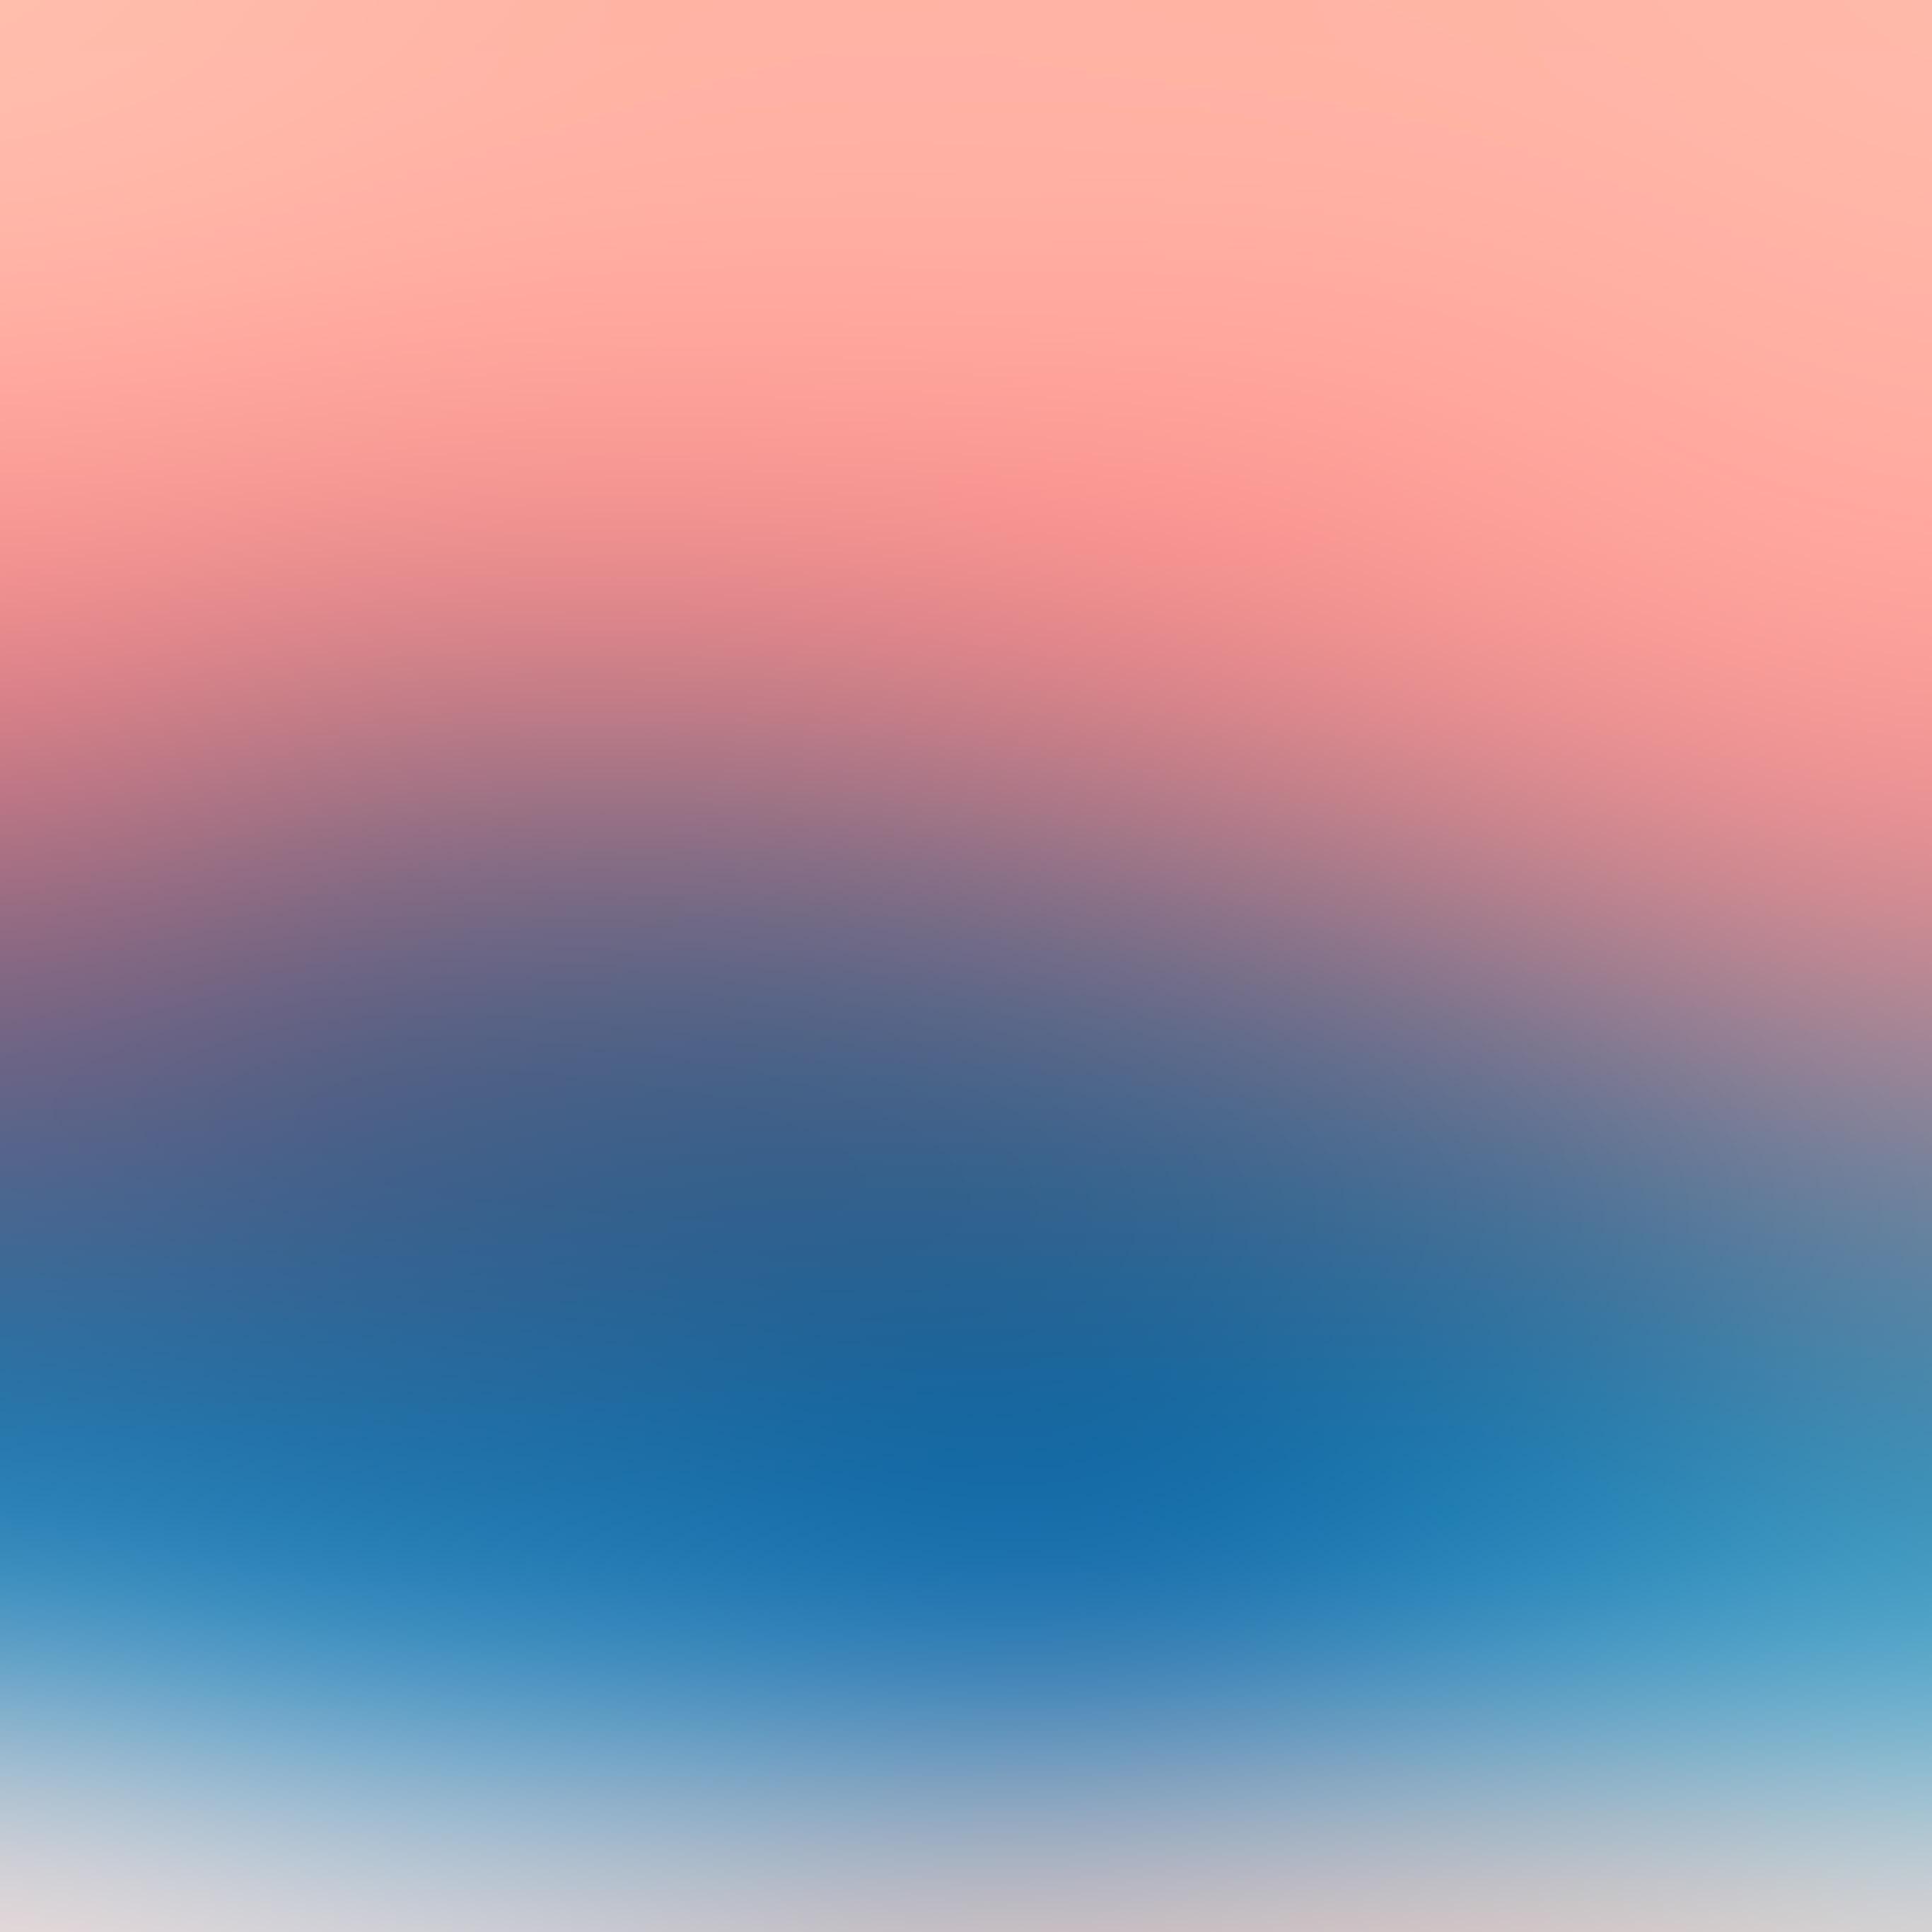 Si31 Pink Blue Gradation Blur Wallpaper